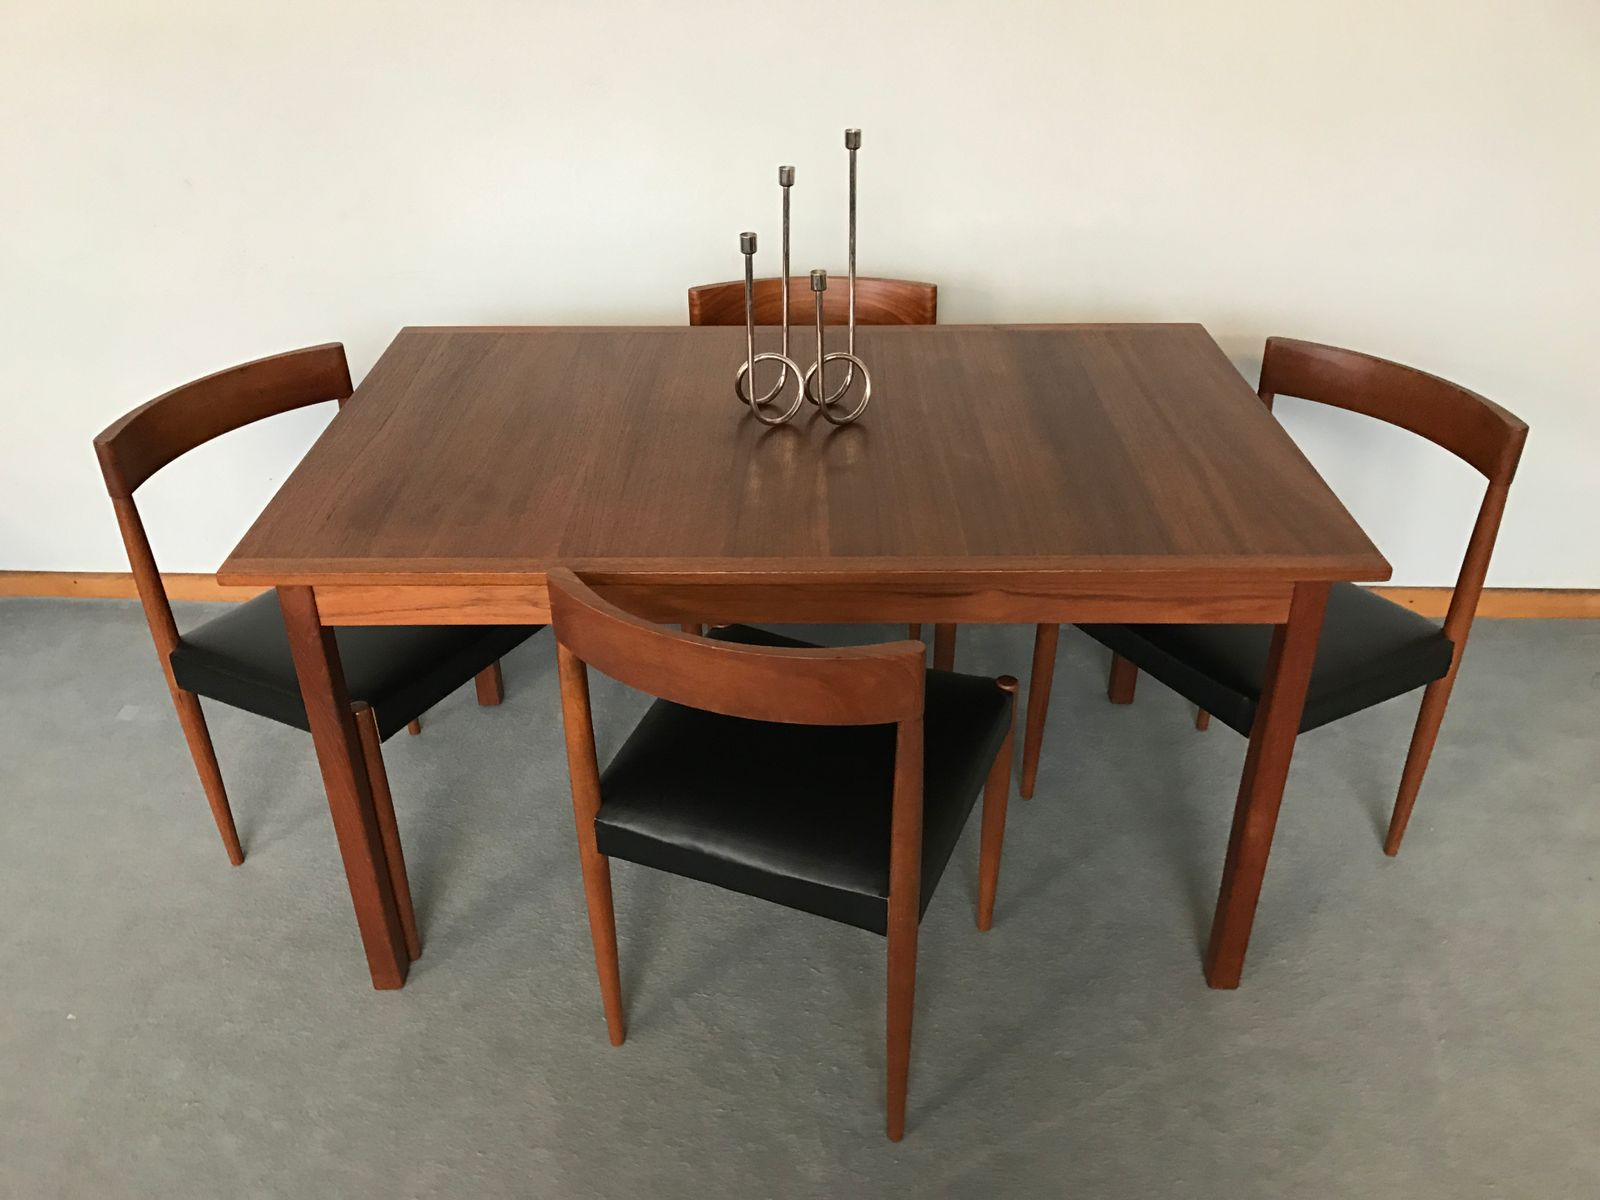 Vintage Scandinavian Teak Dining Table By Nils Jonsson